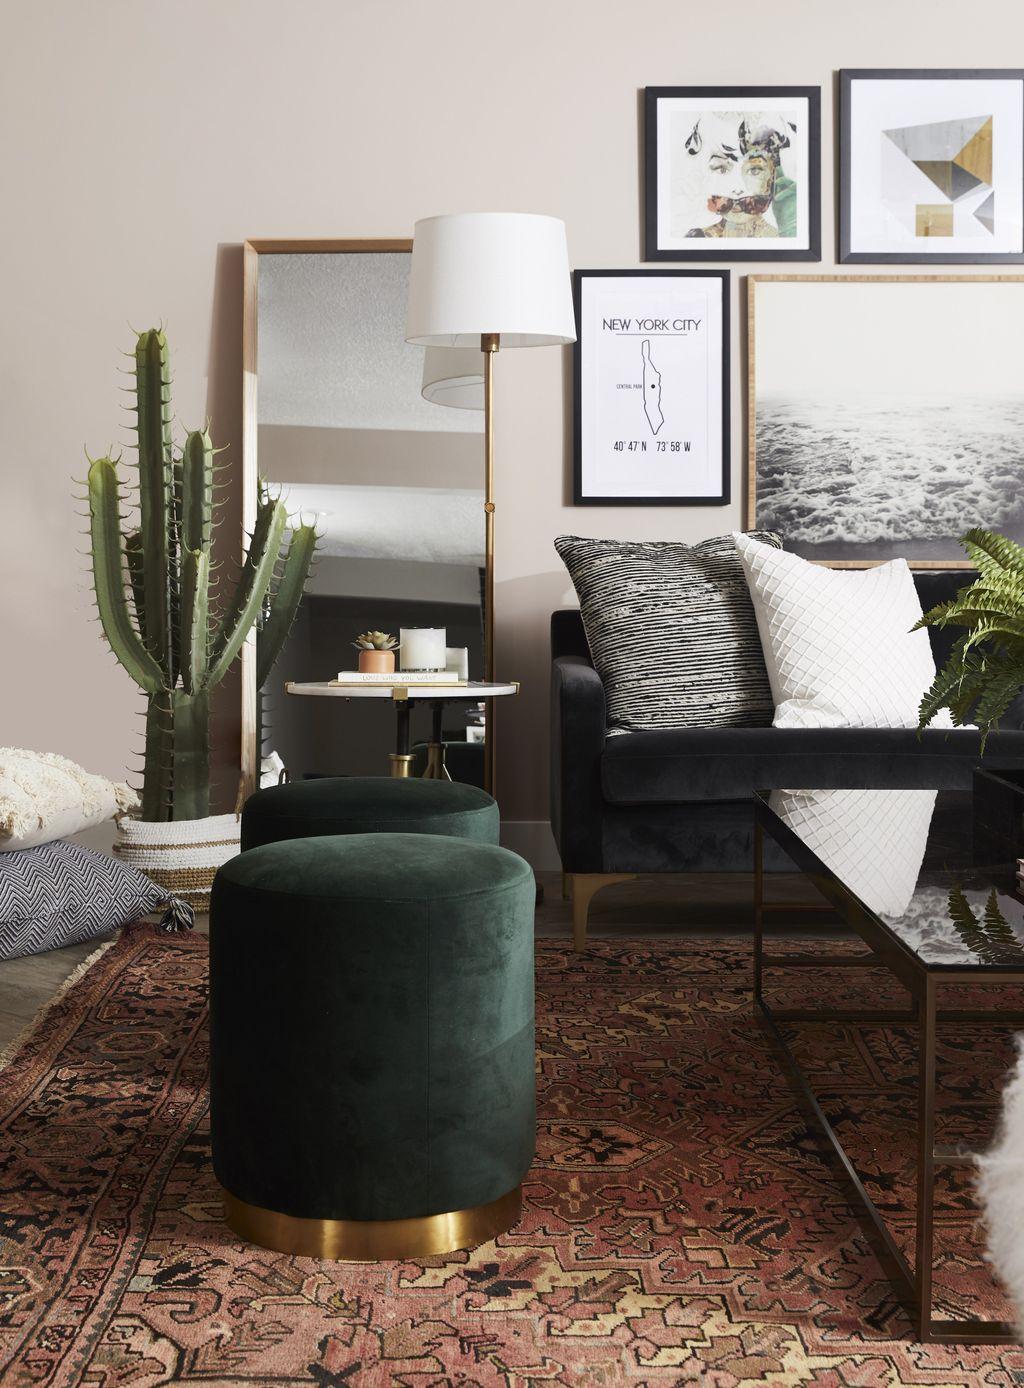 Inspiring Modern Home Furnishings Design Ideas 23